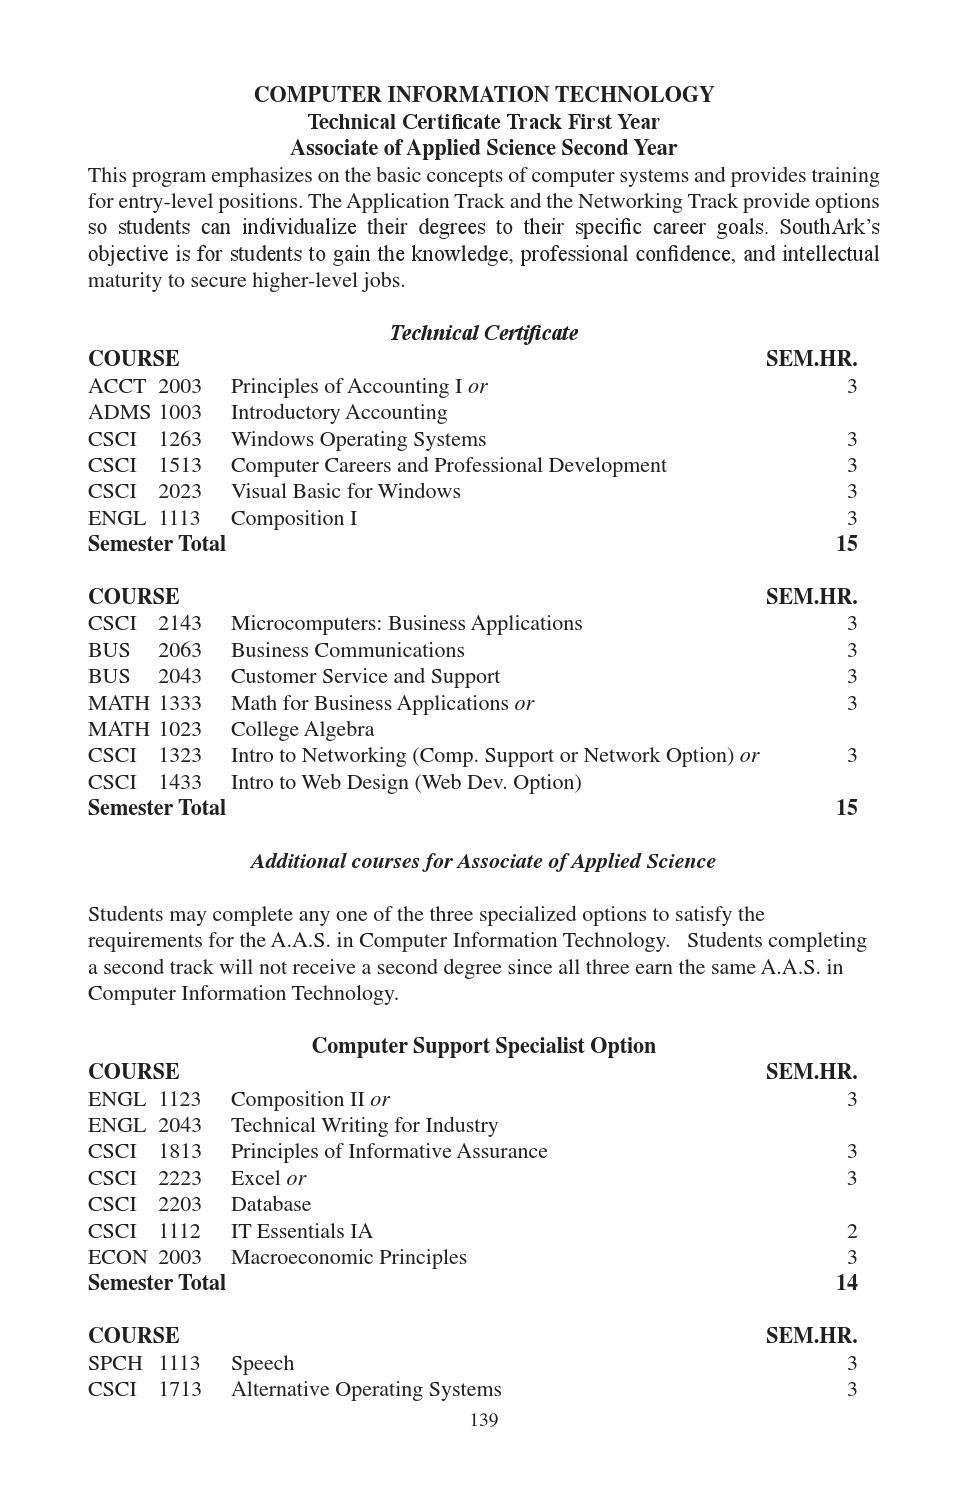 Associate of applied science in information technology jobs